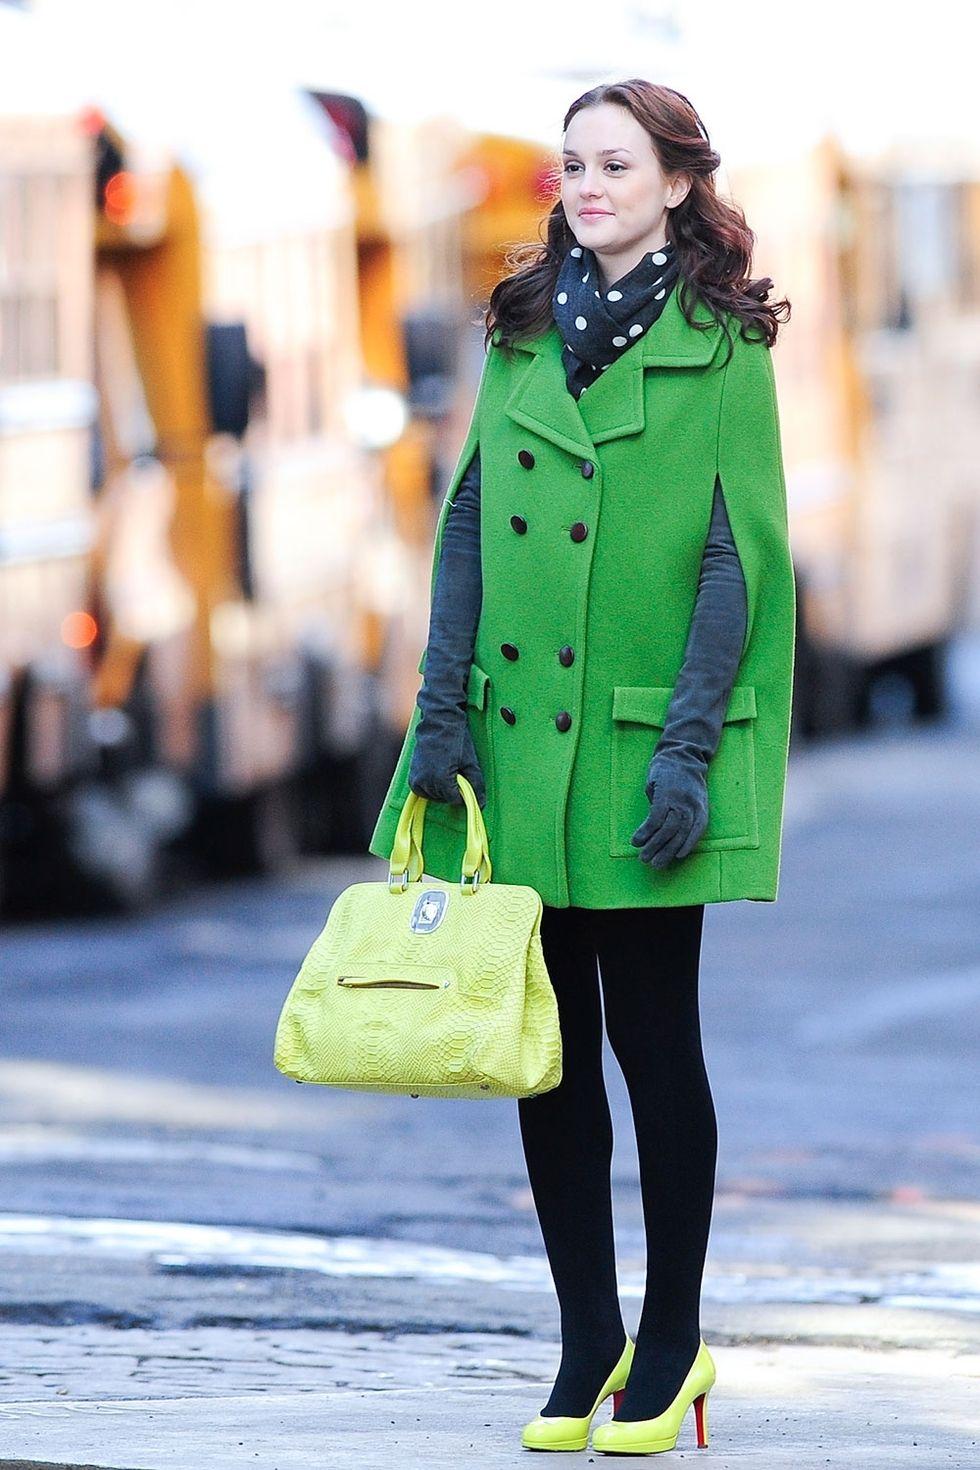 SOURCE:  http://www.cosmopolitan.com/style-beauty/fashion/g5747/blair-waldorf-gossip-girl-looks/